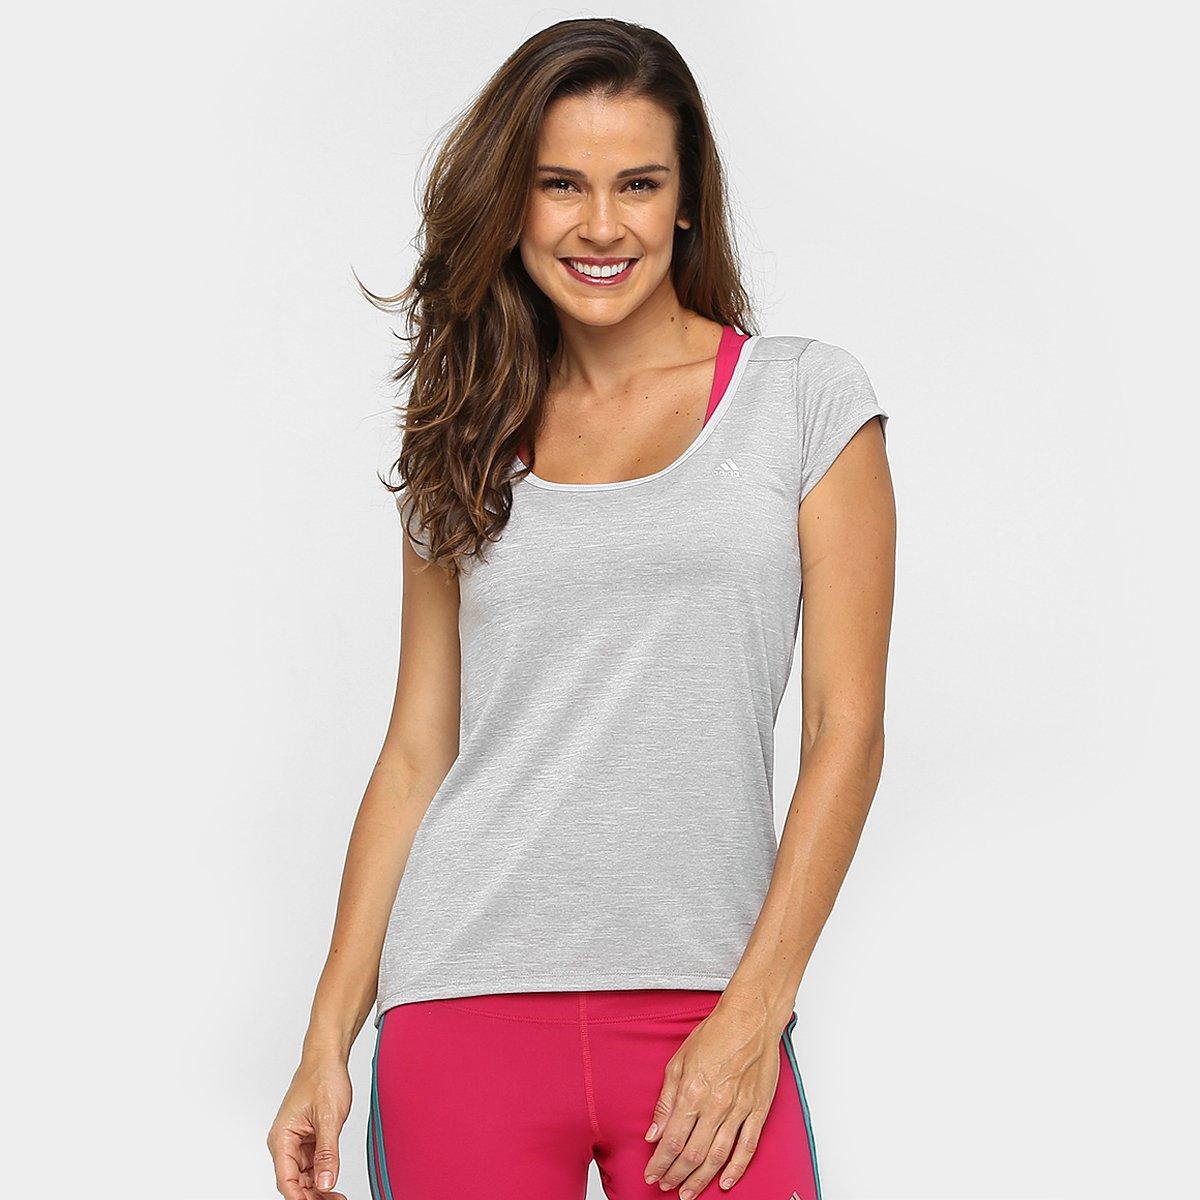 Cinza Clima Feminina Camiseta Adidas Ess Camiseta Ess Mescla Clima Adidas zPYUqP